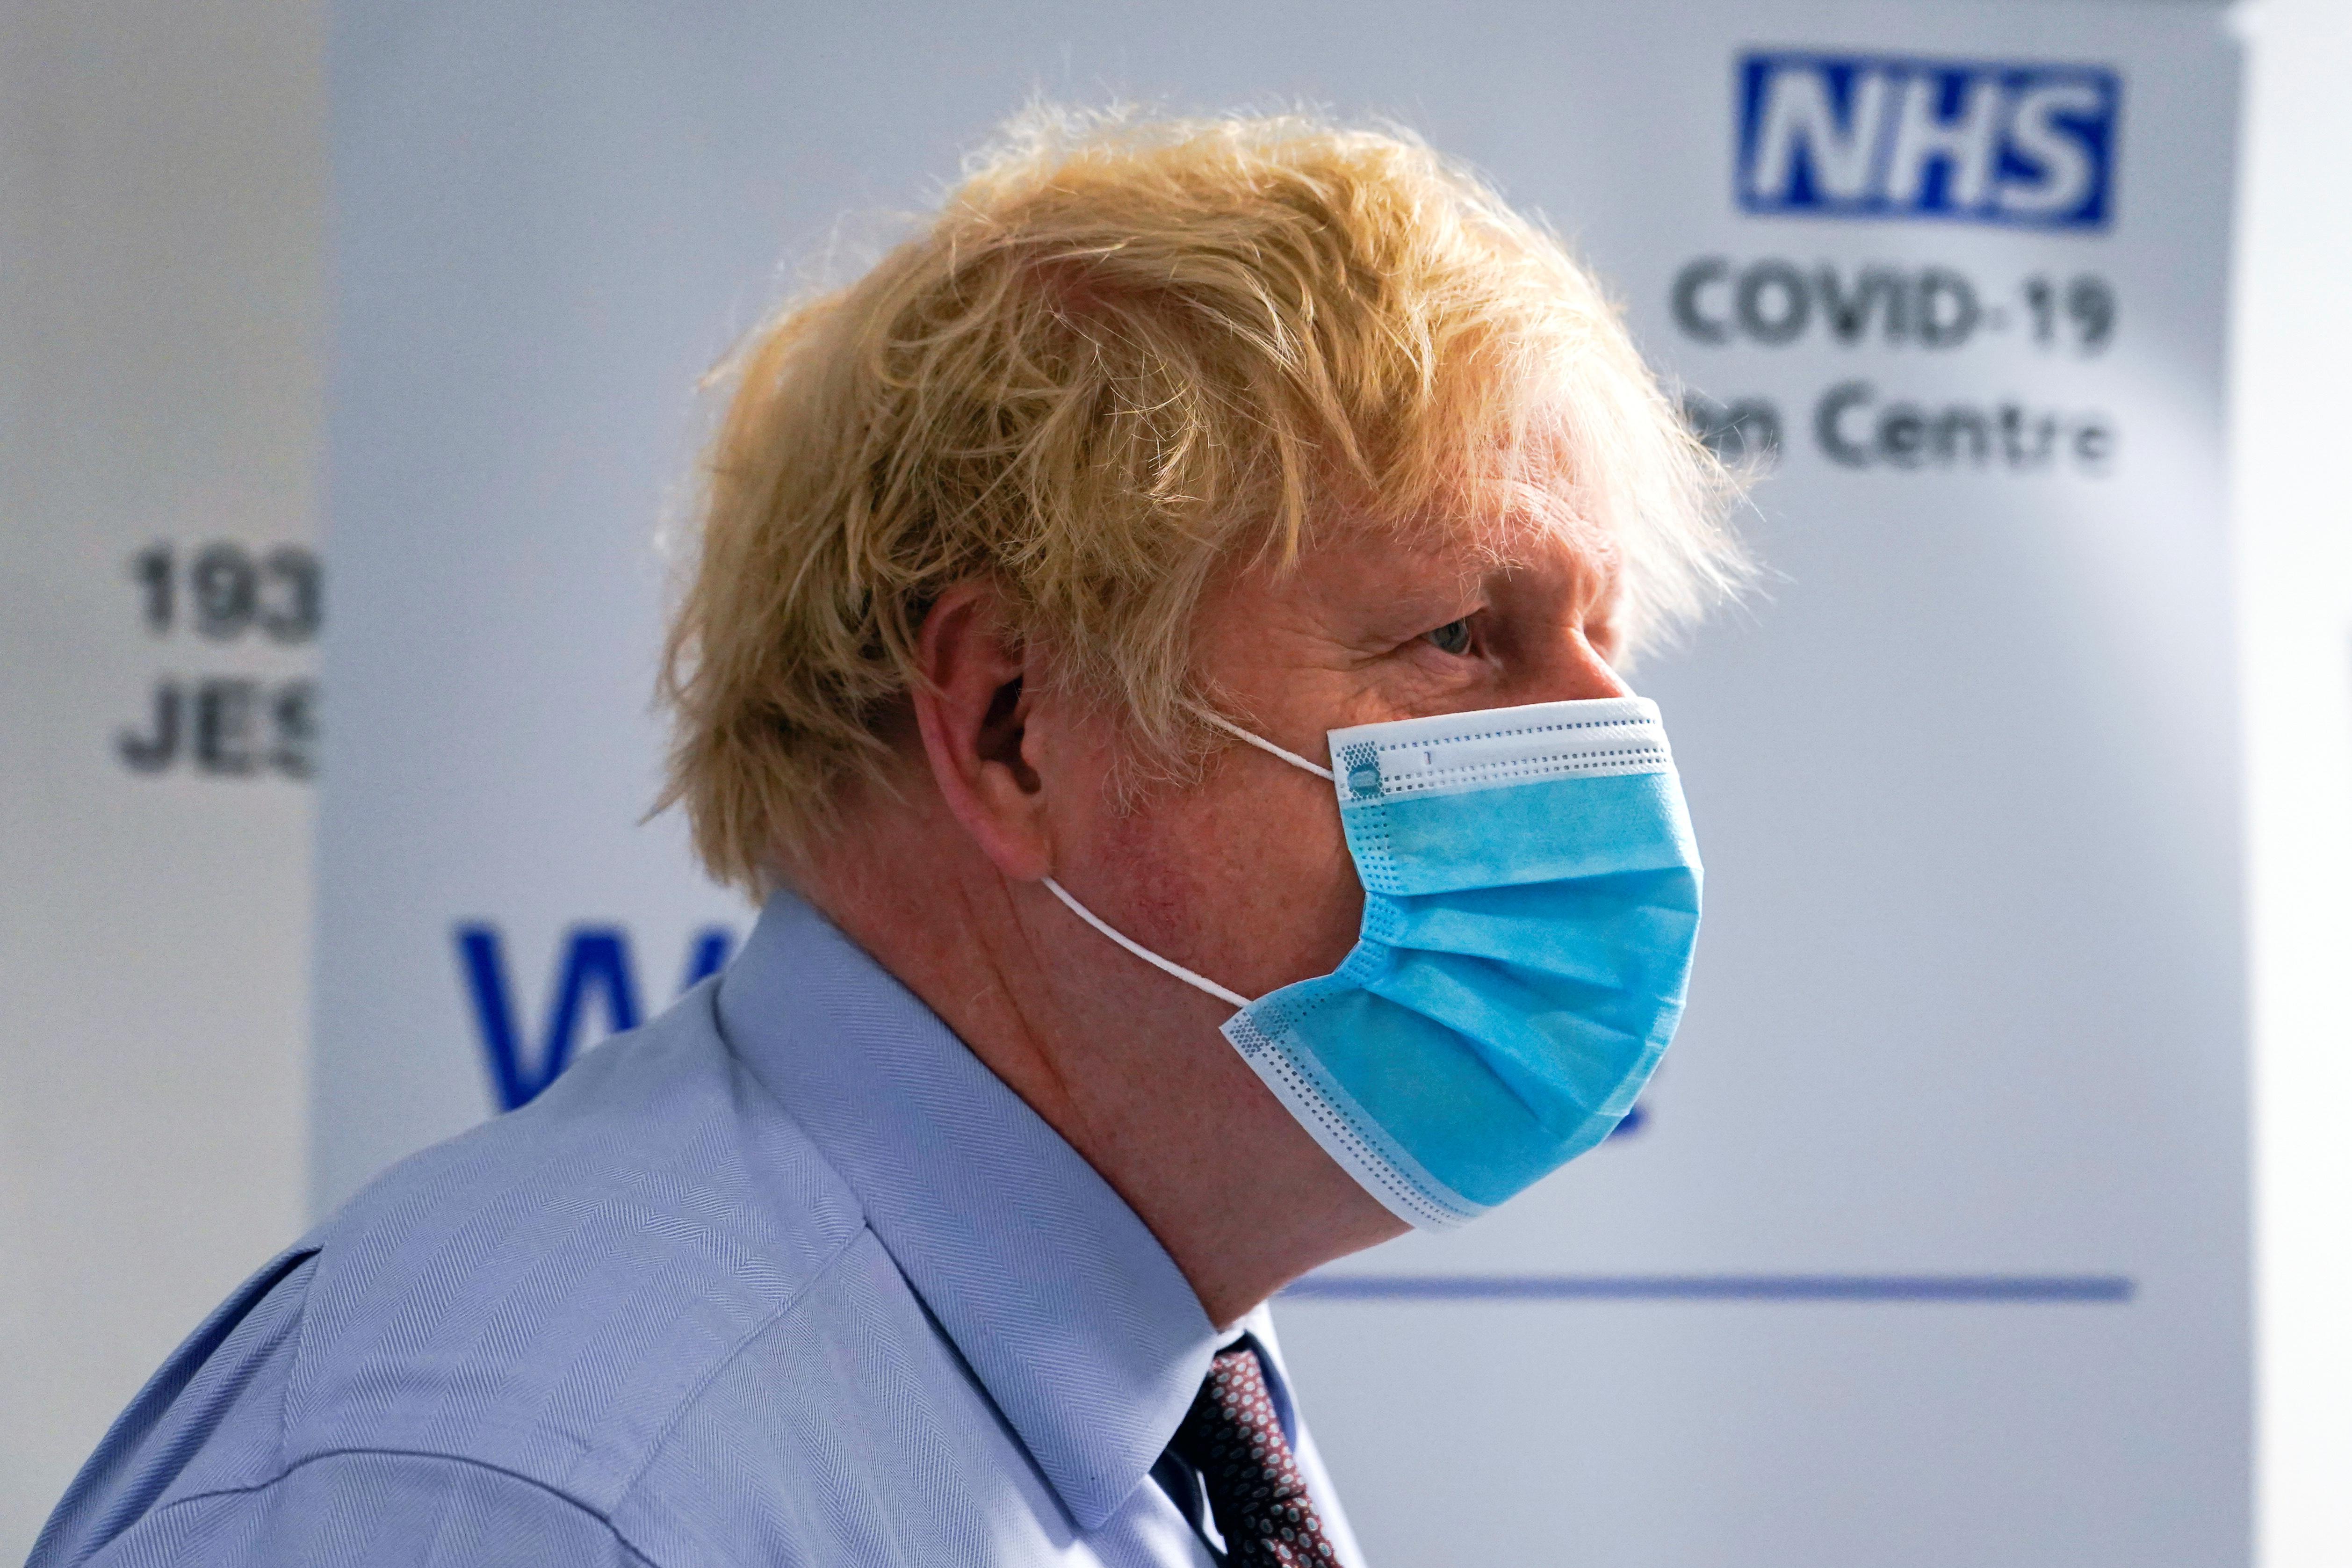 Britain's Prime Minister Boris Johnson visits a vaccination centre at the StoneX Stadium, home of the rugby club Saracens, amid coronavirus disease (COVID-19) pandemic, in North London, Britain June 21, 2021. Alberto Pezzali/Pool via REUTERS